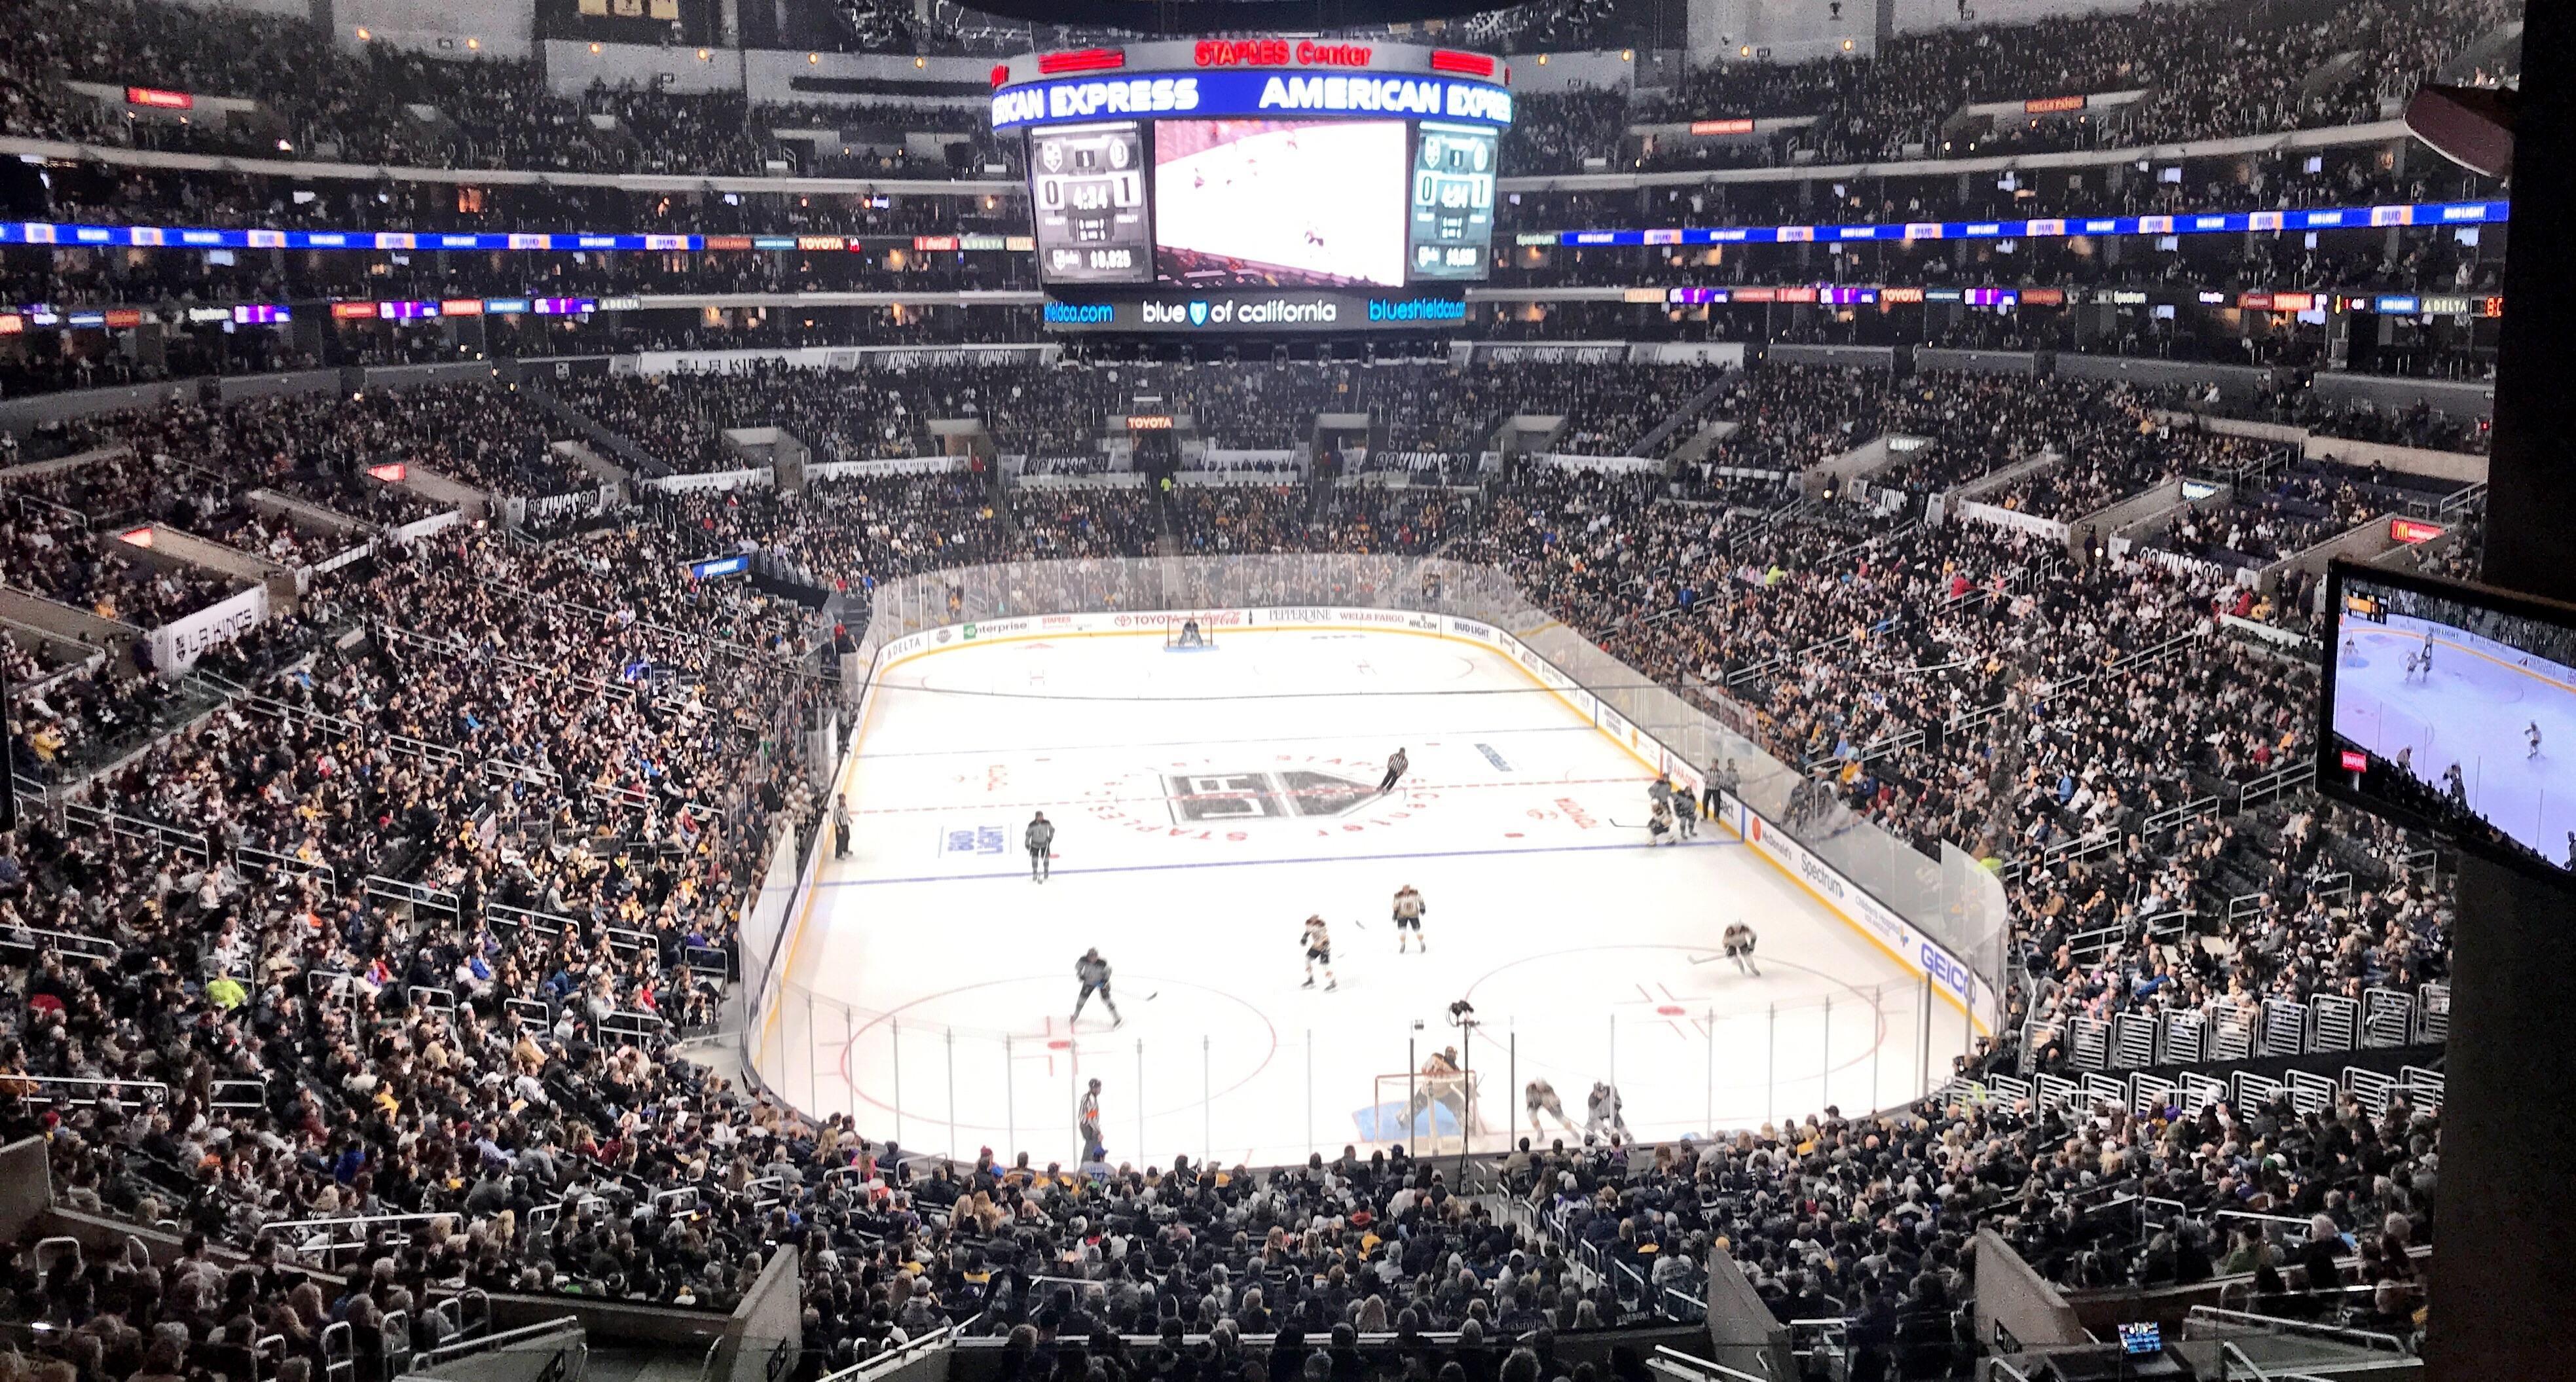 Staples Center Kings Bruins Game Tonight Los Angeles Staples